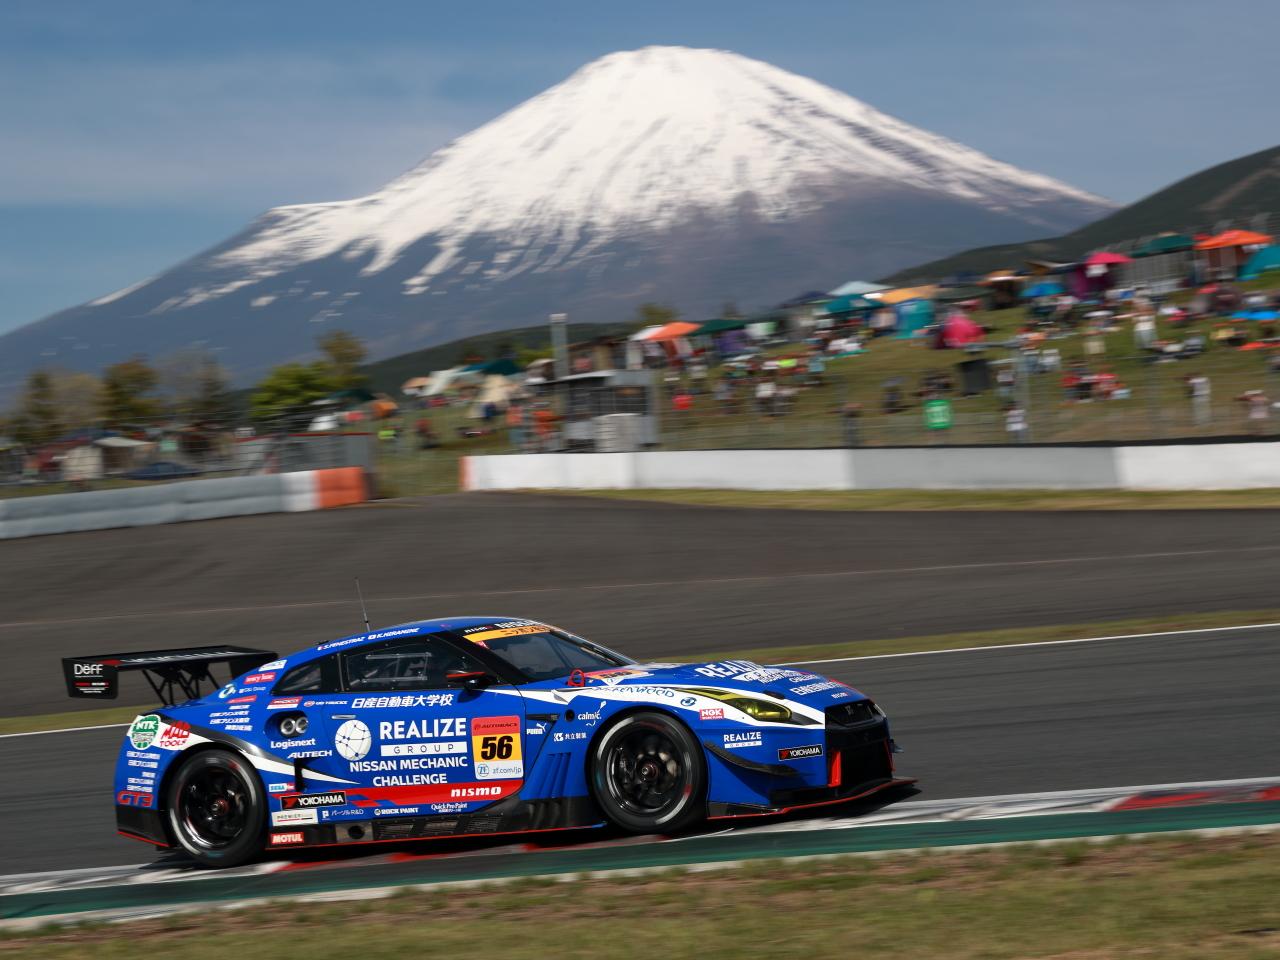 「【SUPER GT 2019】GT300ポールポジション獲得の立役者、サッシャ・フェネストラズってどんな人?」の2枚目の画像